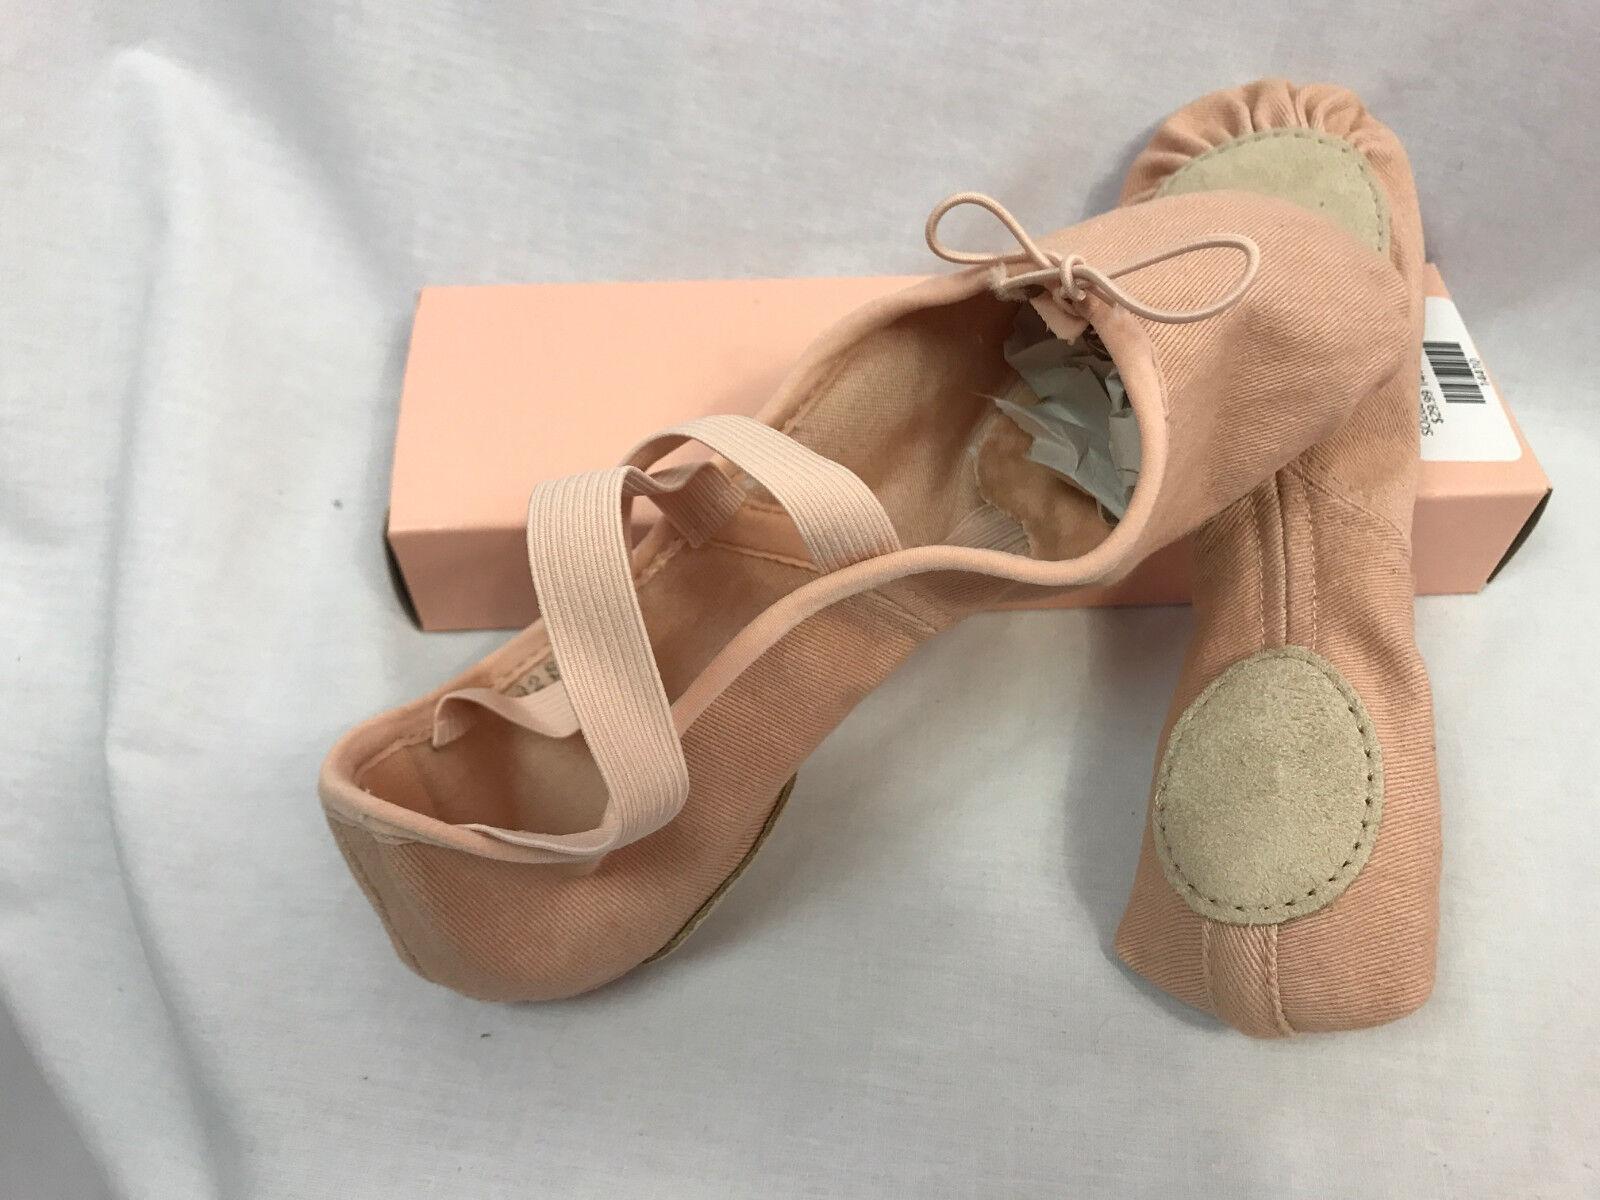 Bloch Womens Zenith Stretch Canvas Ballet Shoes